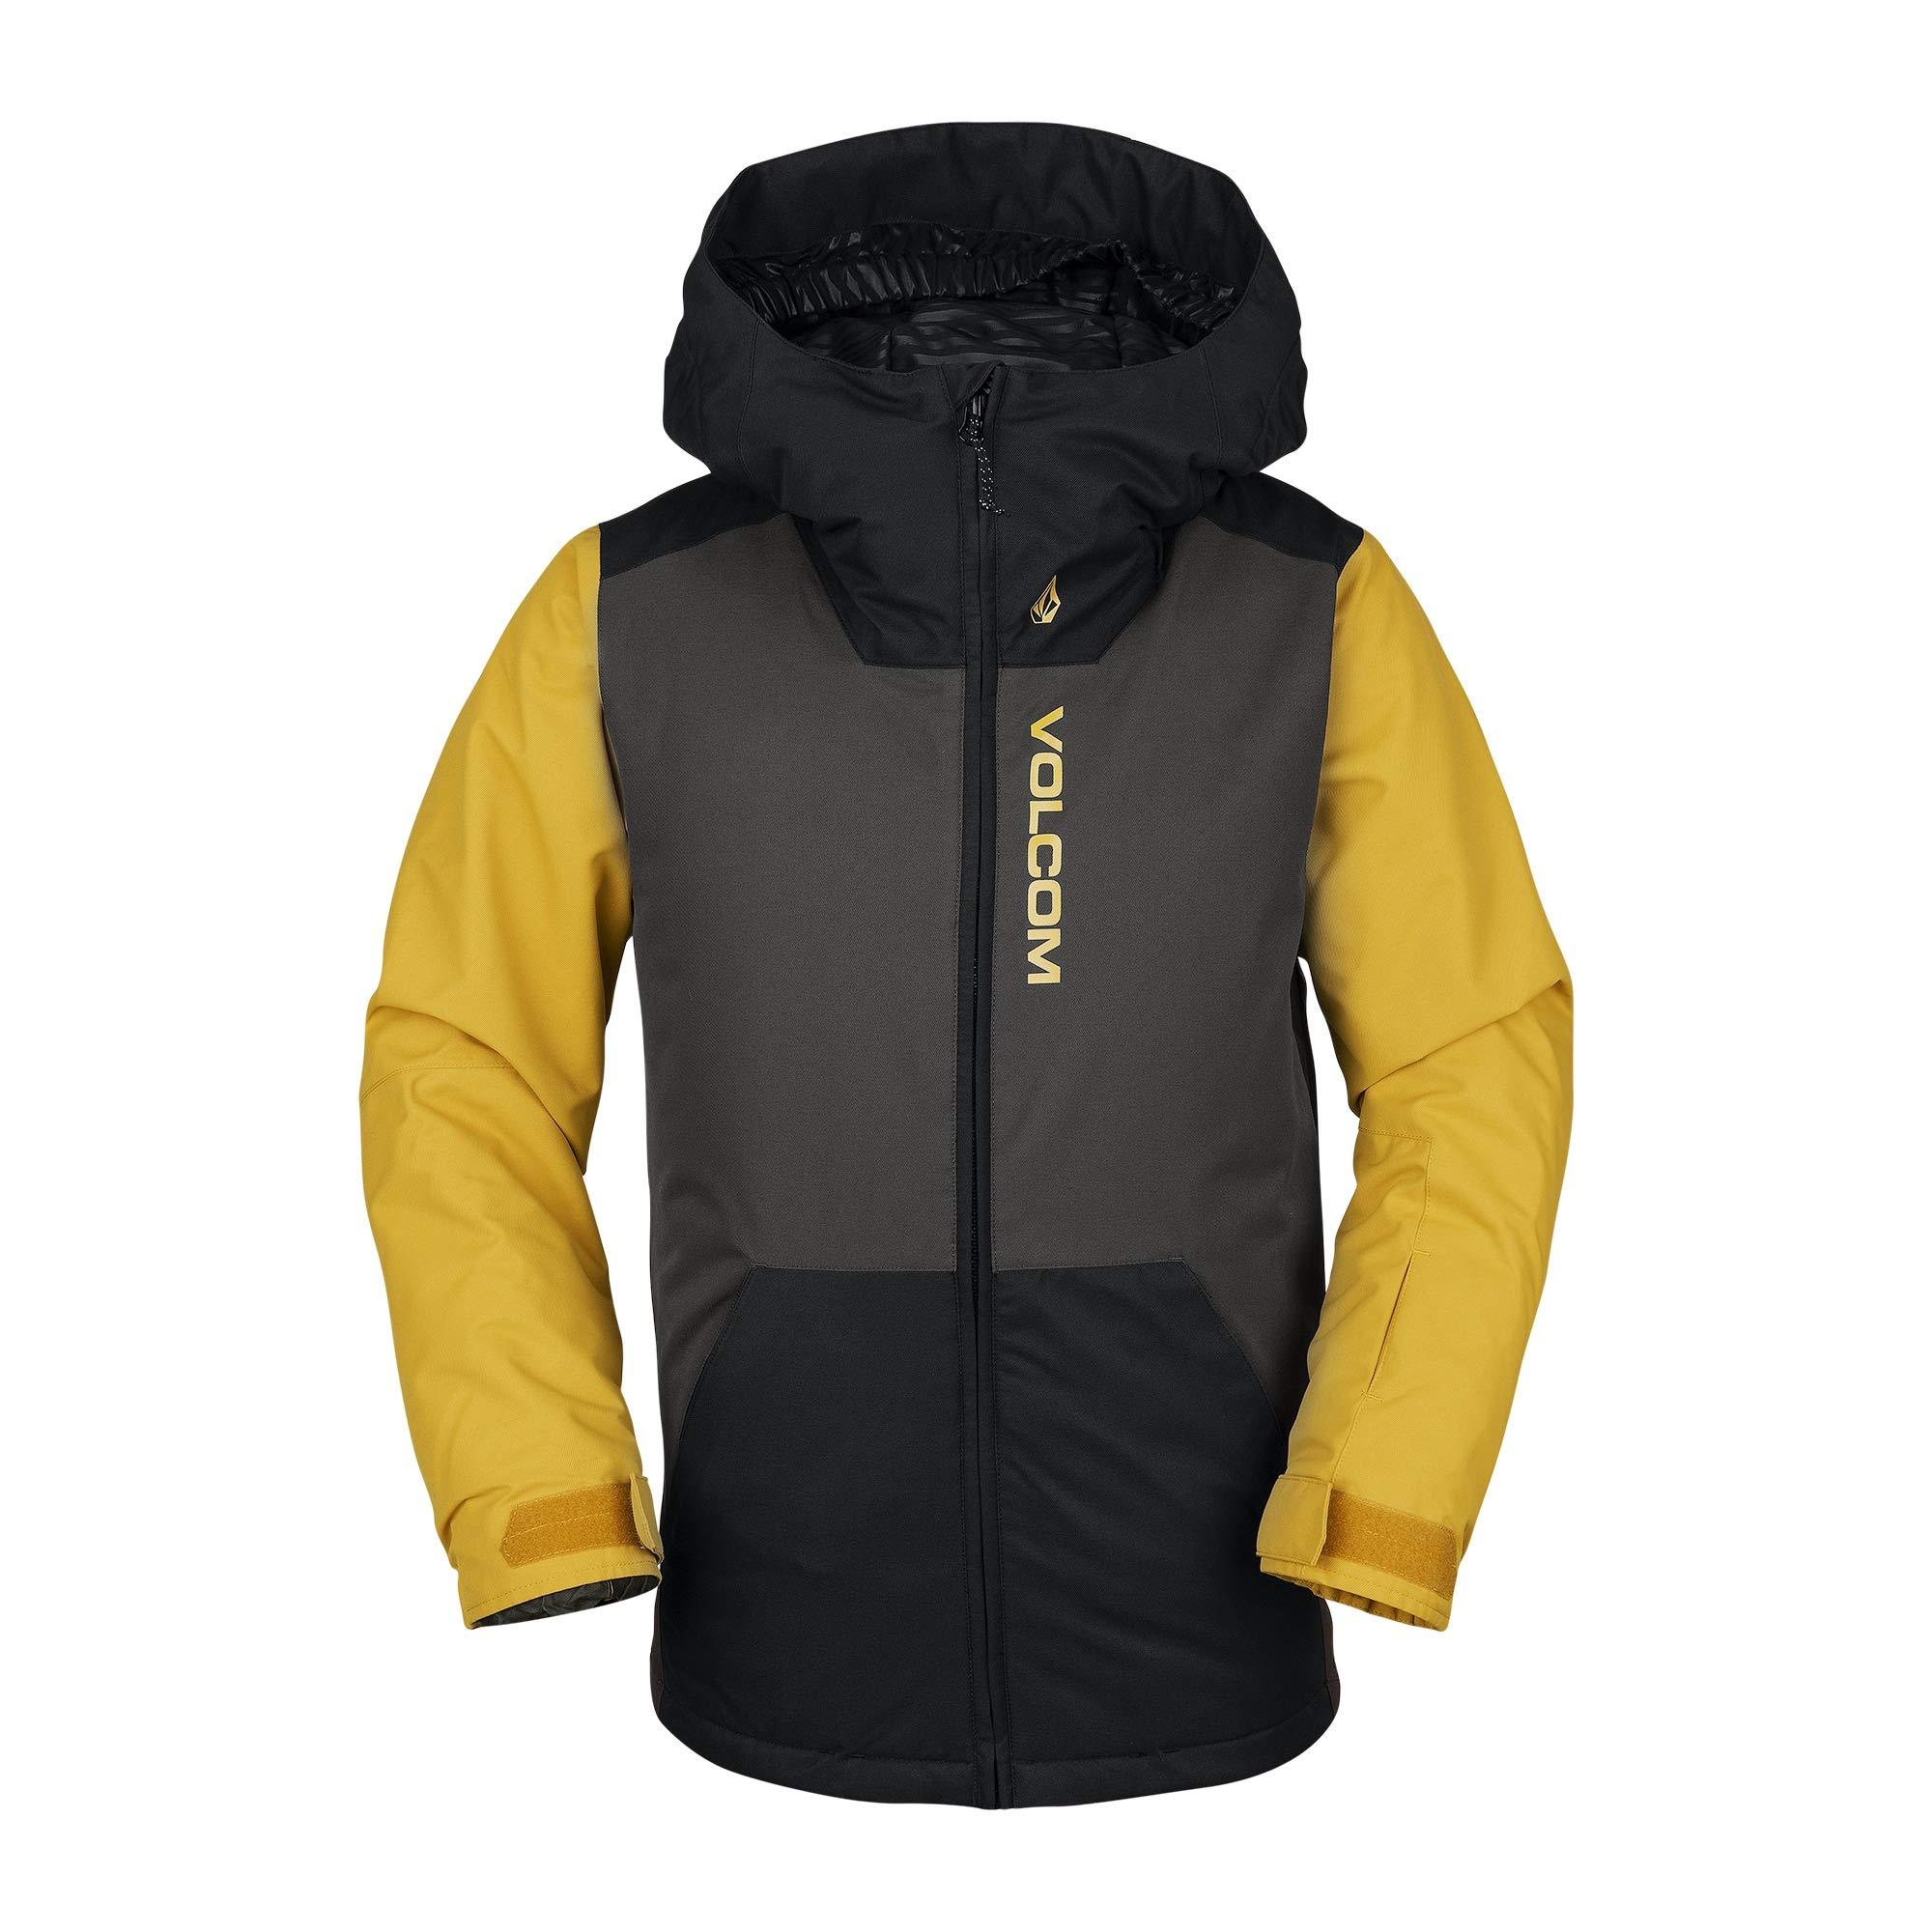 Volcom Boys' Big Vernon Insulated 2 Layer Shell Snow Jacket, Vintage Black, Extra Small by Volcom